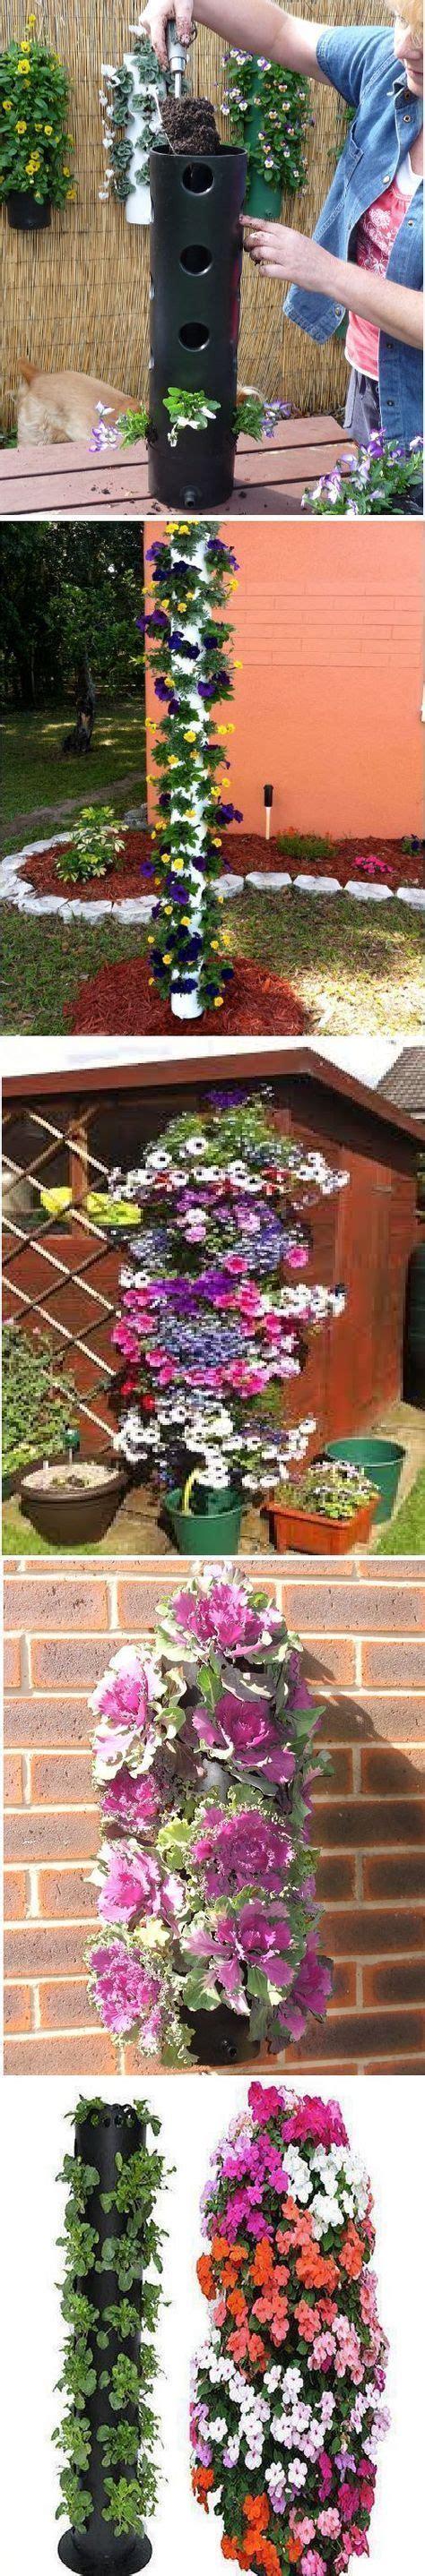 Polanter Vertical Gardening System by Best 25 Vertical Vegetable Gardens Ideas On